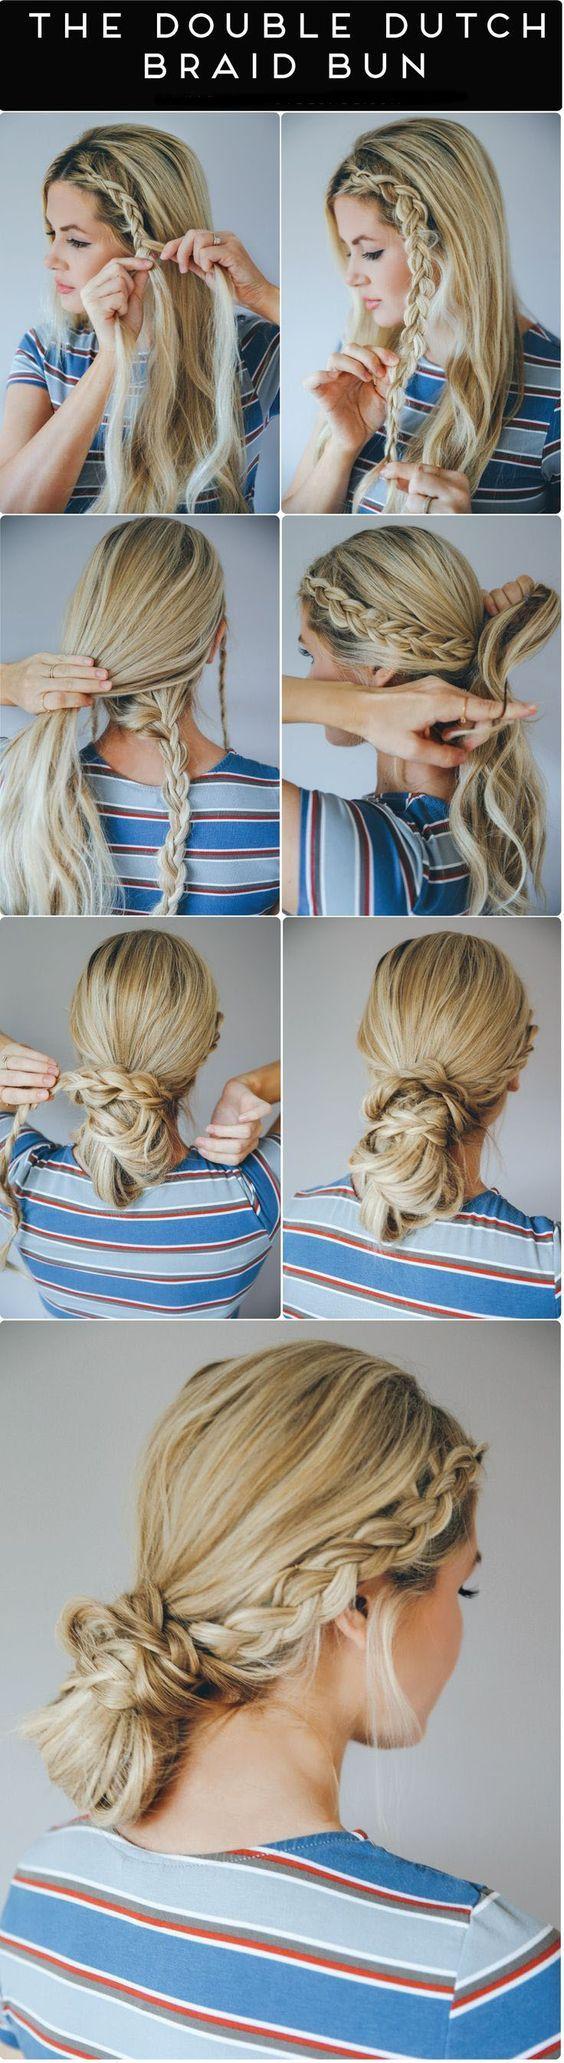 best hair tutorials images on pinterest hairstyle ideas